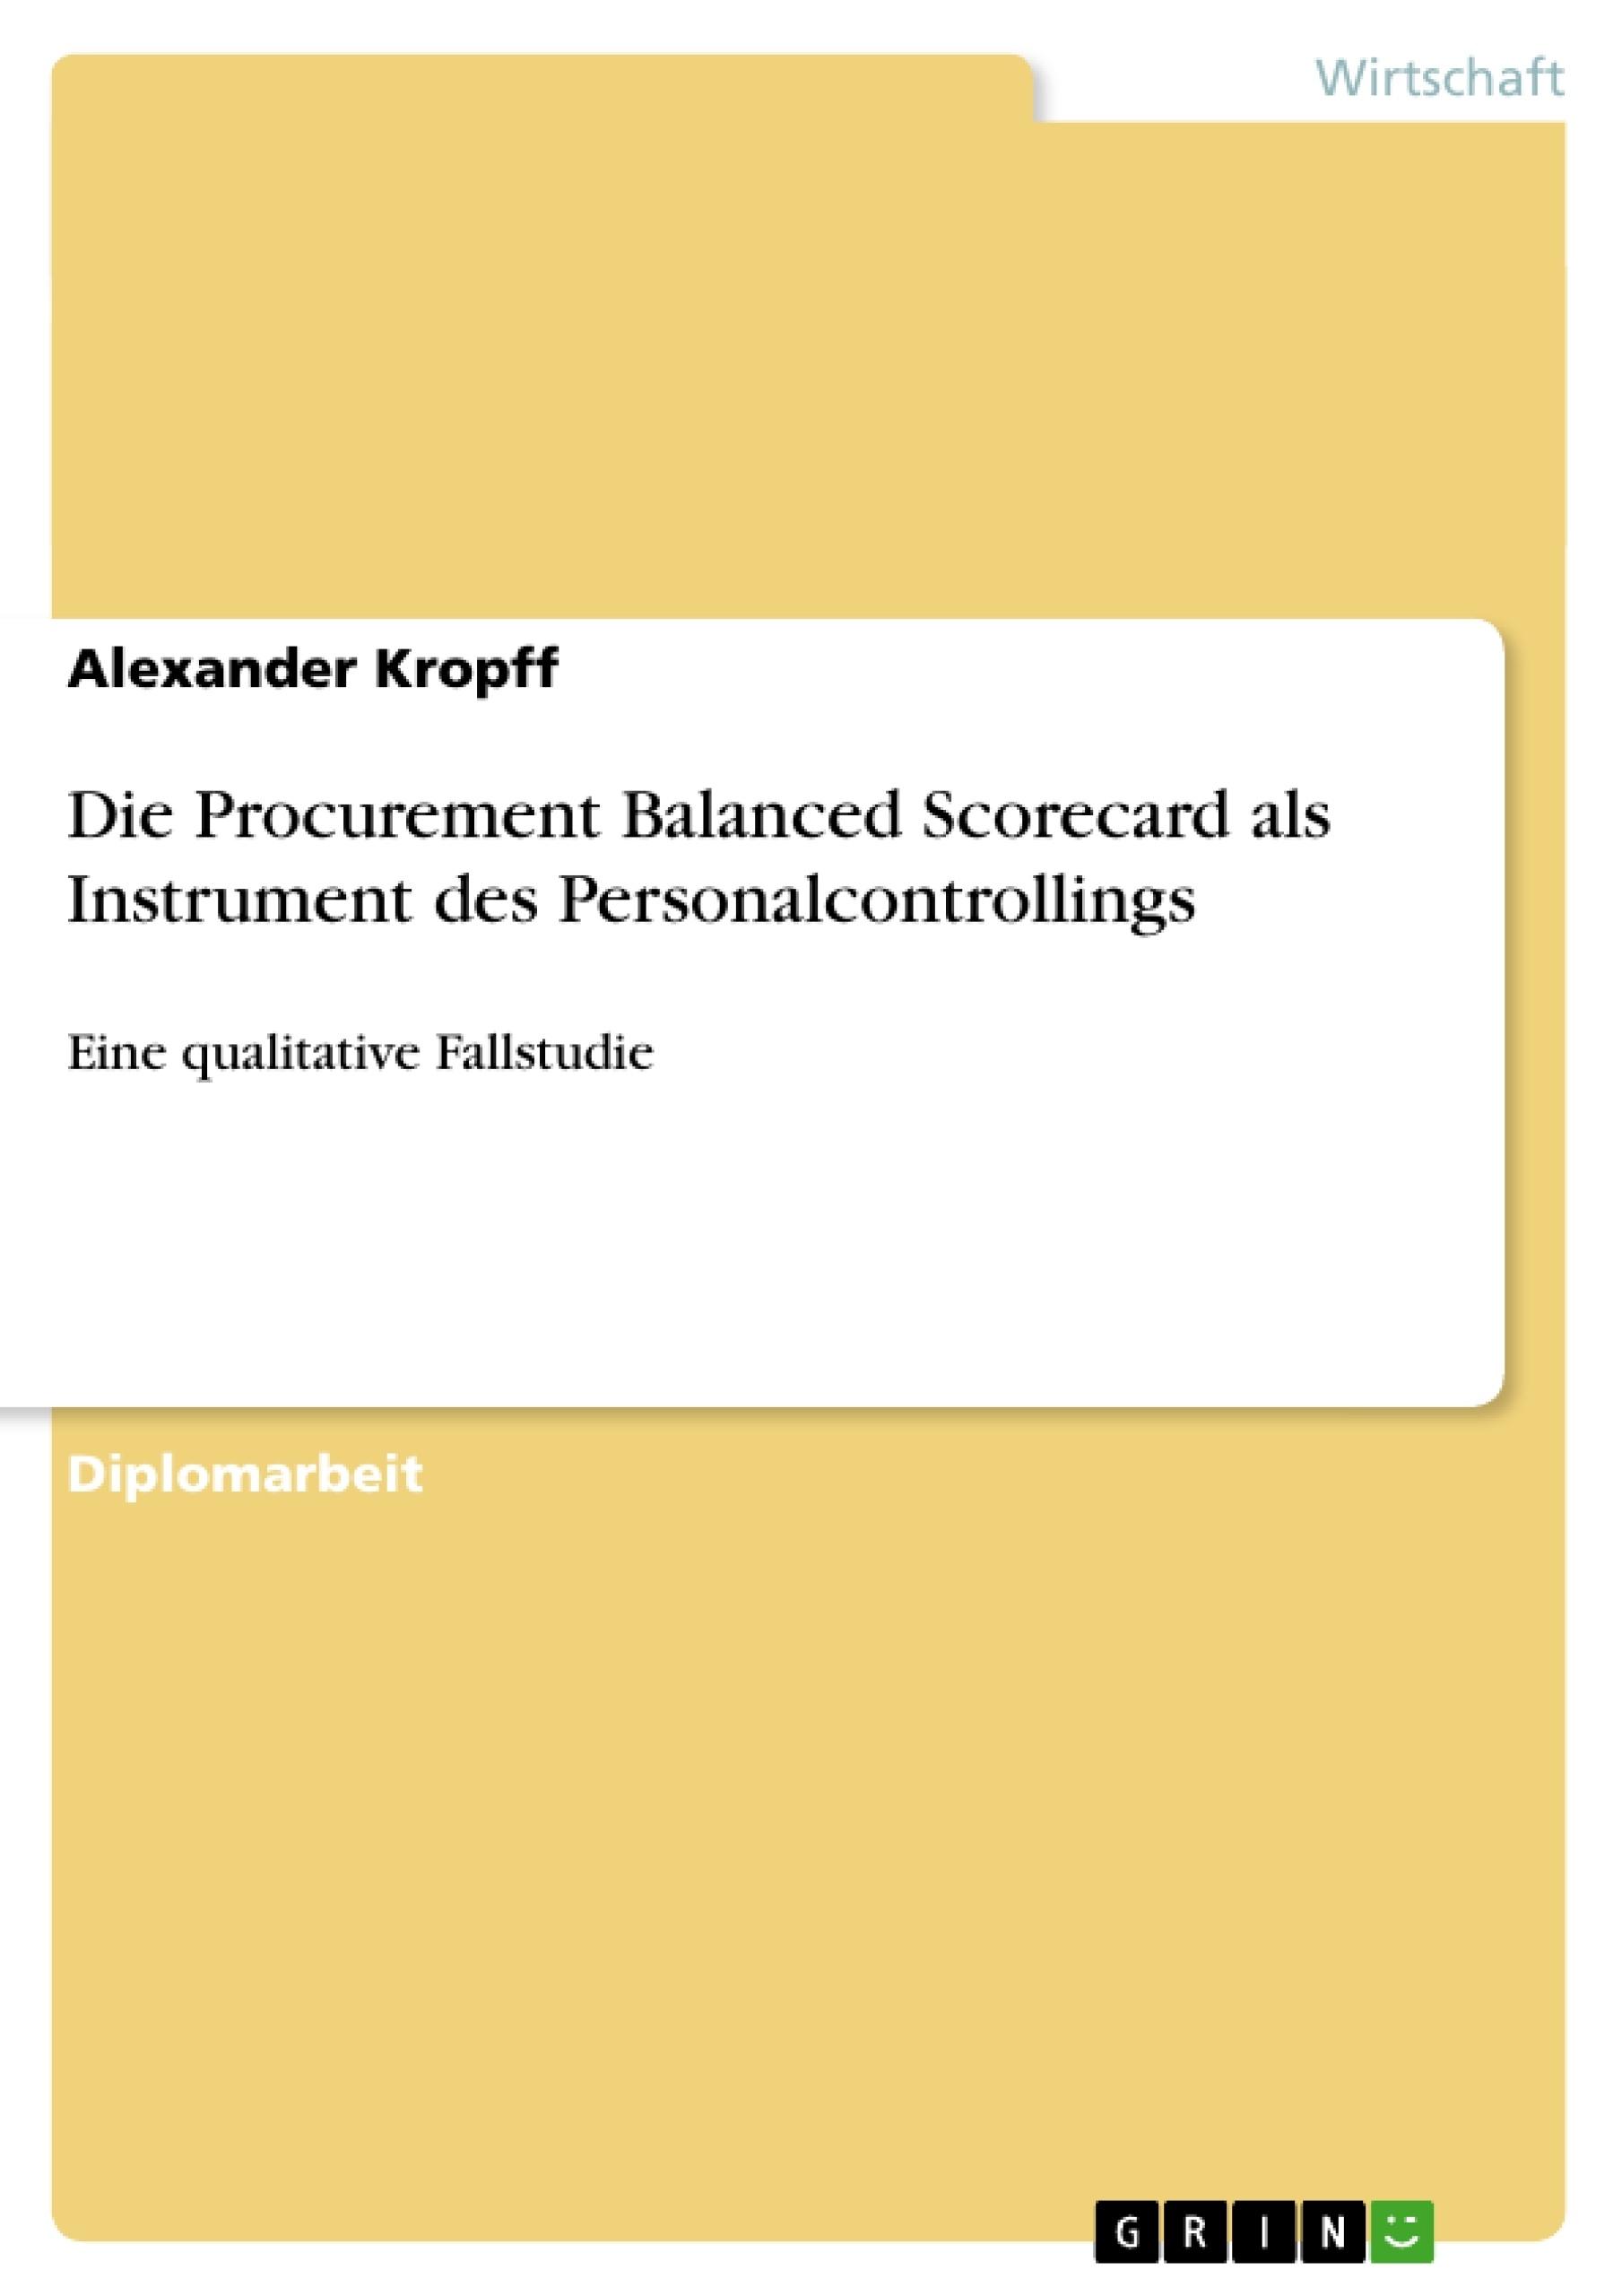 Titel: Die Procurement Balanced Scorecard als Instrument des Personalcontrollings